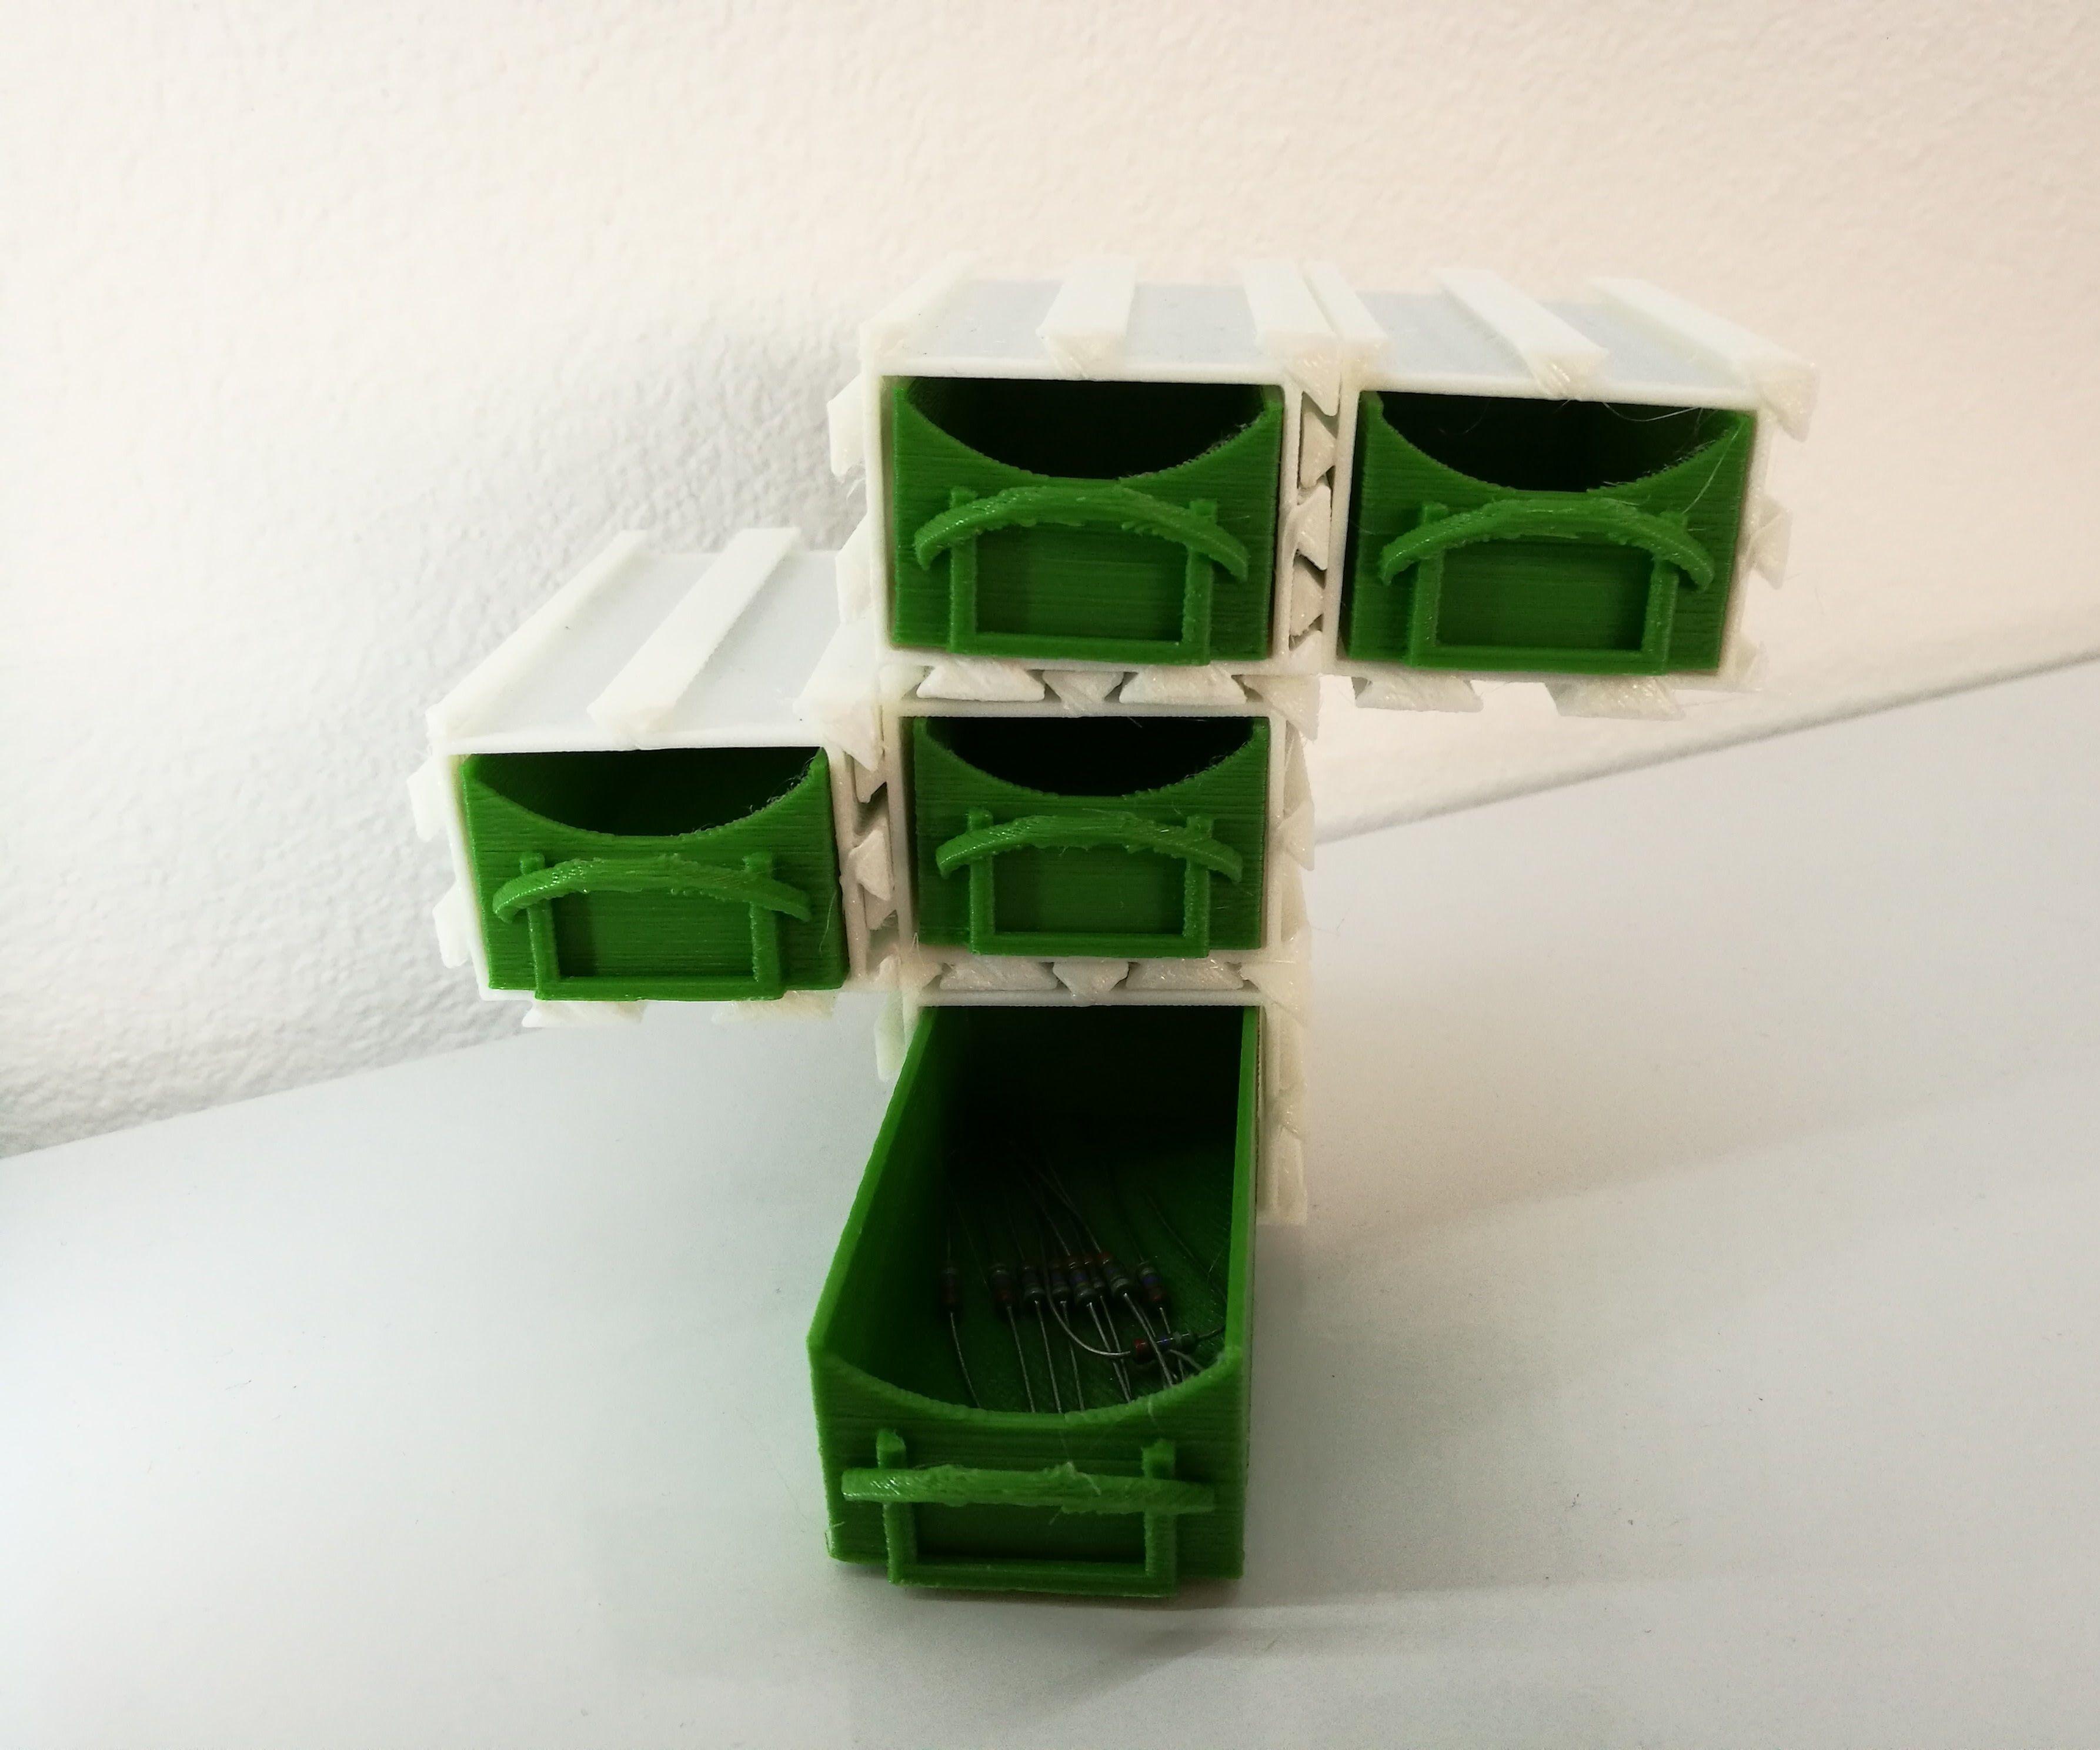 How to Design a 3D-Printable Box